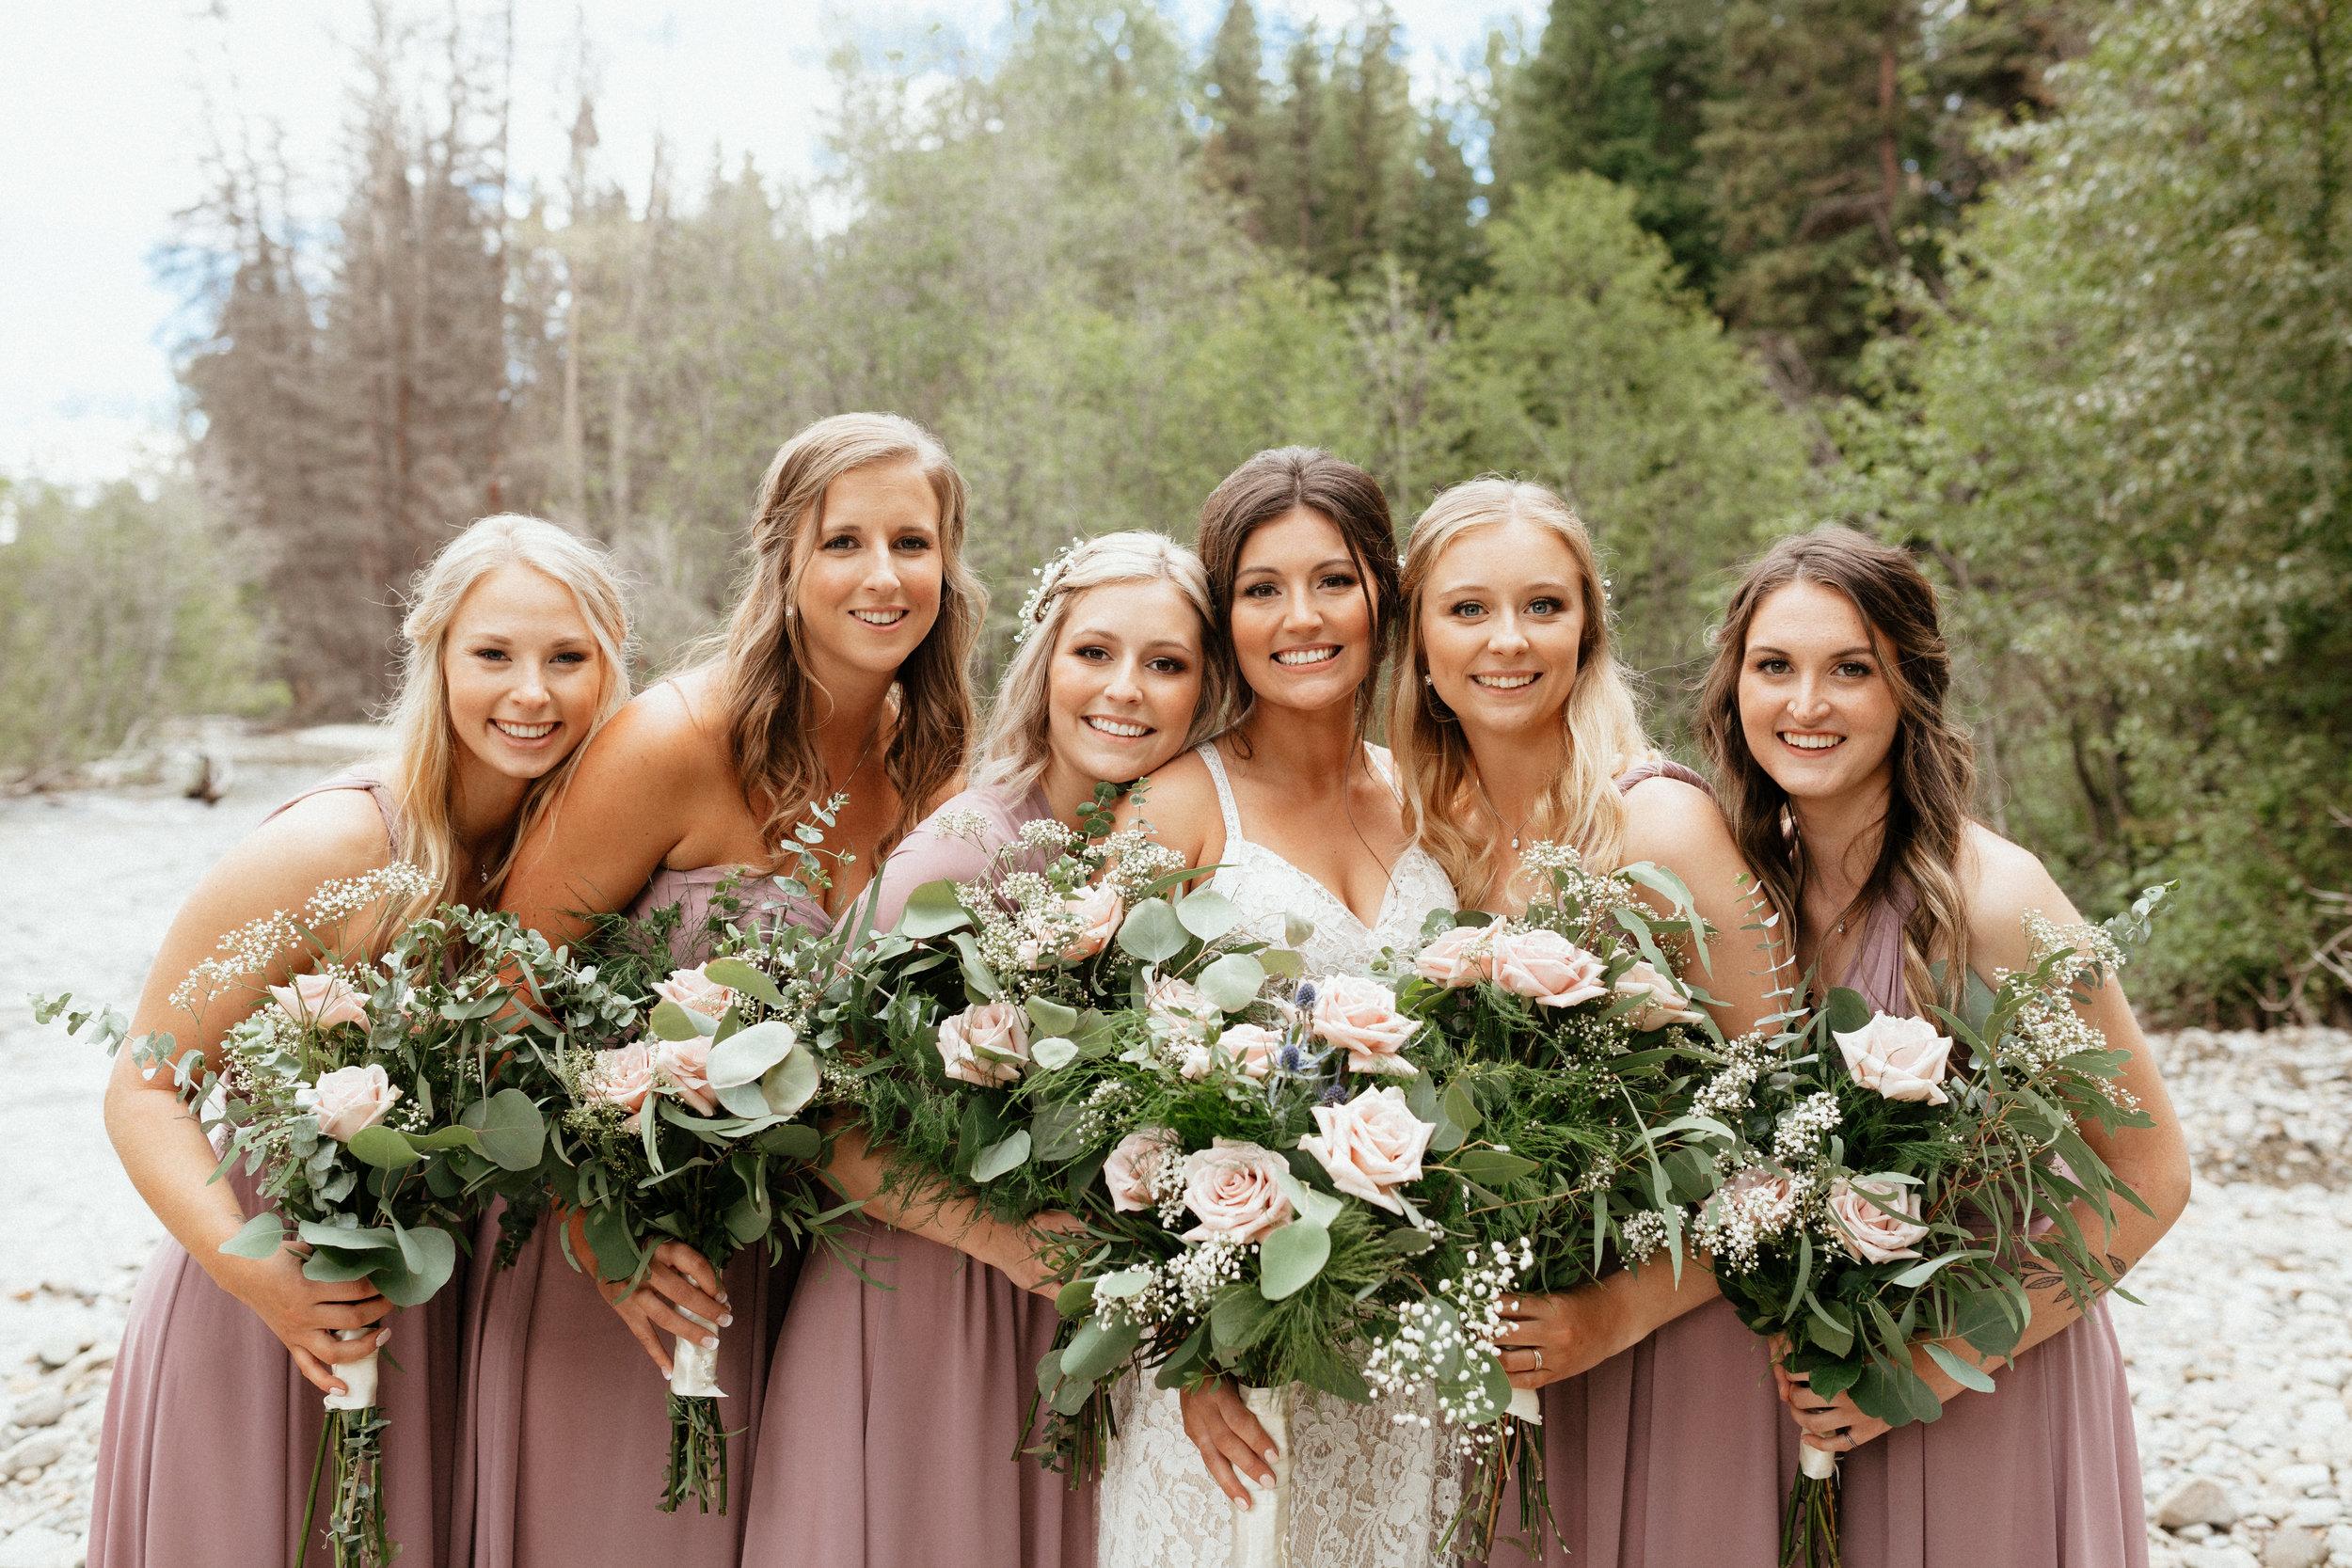 Dane + Jessica 4 - Bridal Portraits-55.jpg